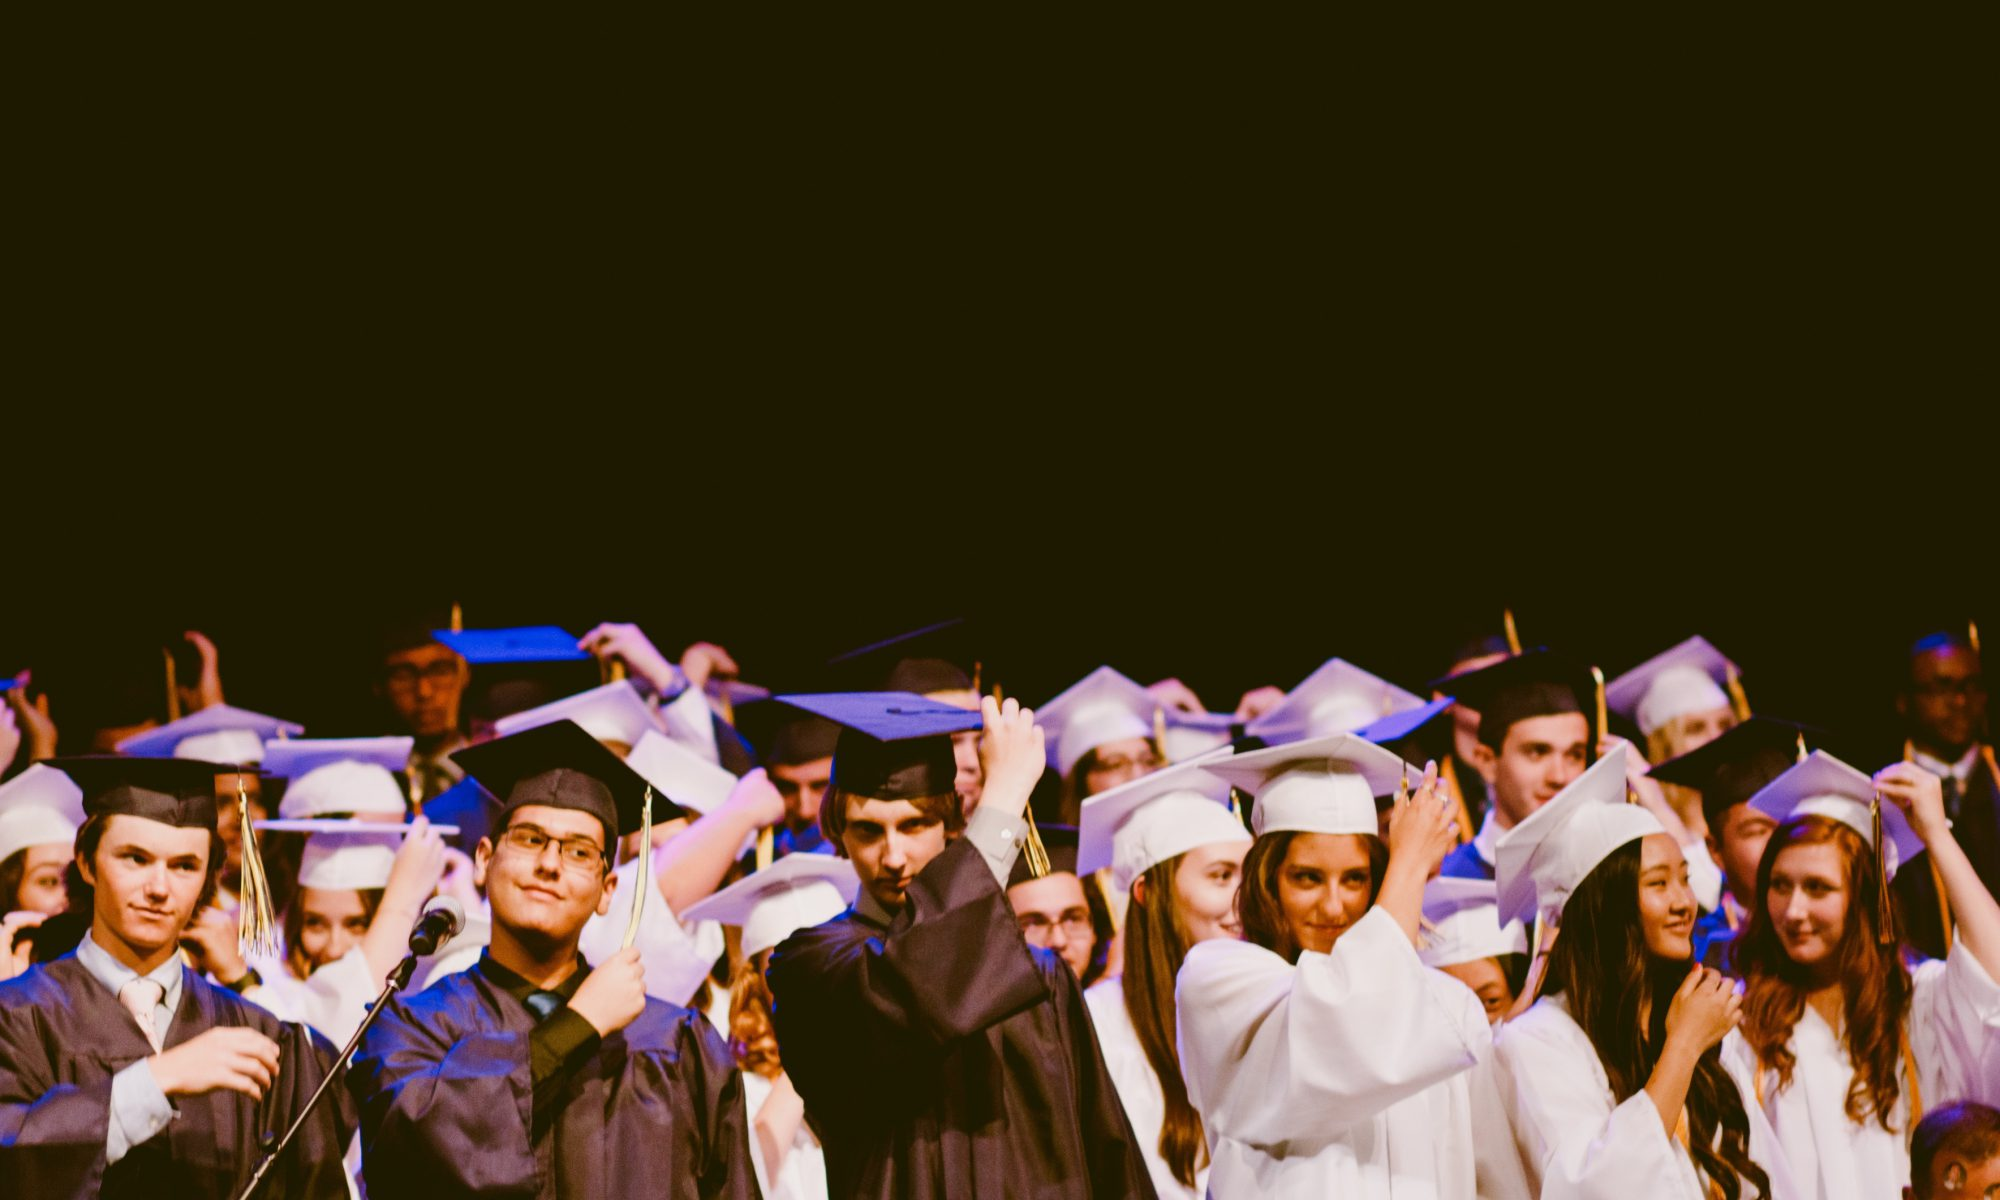 NSPRA: Social School Public Relations